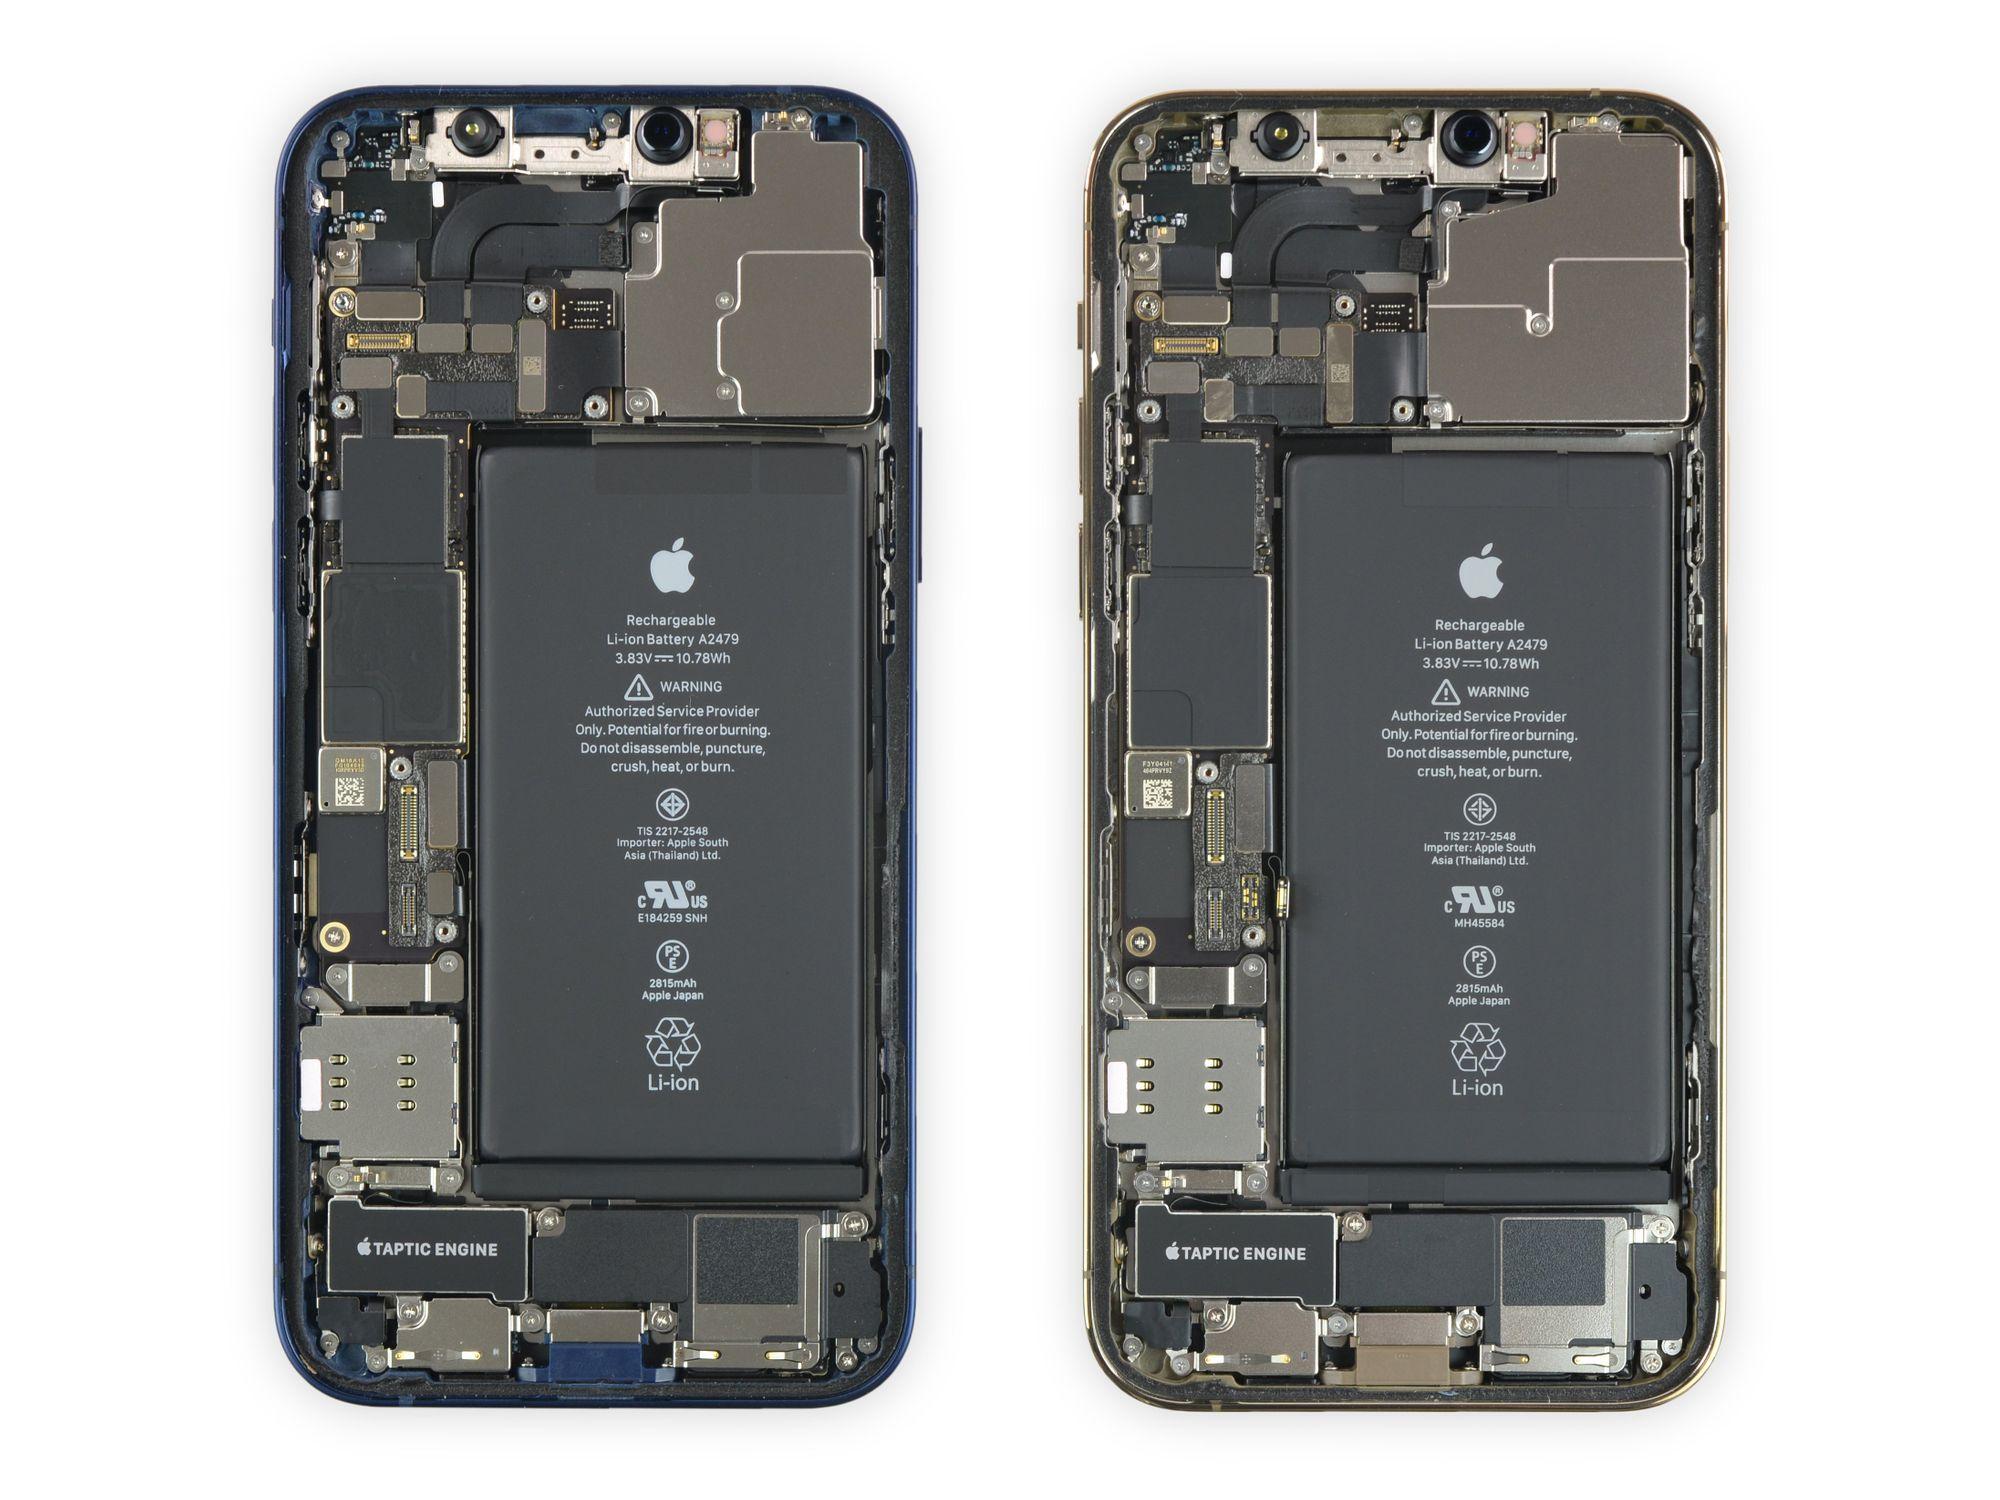 iPhone 12 à esquerda e iPhone 12 Pro à direita - Imagem iFixit